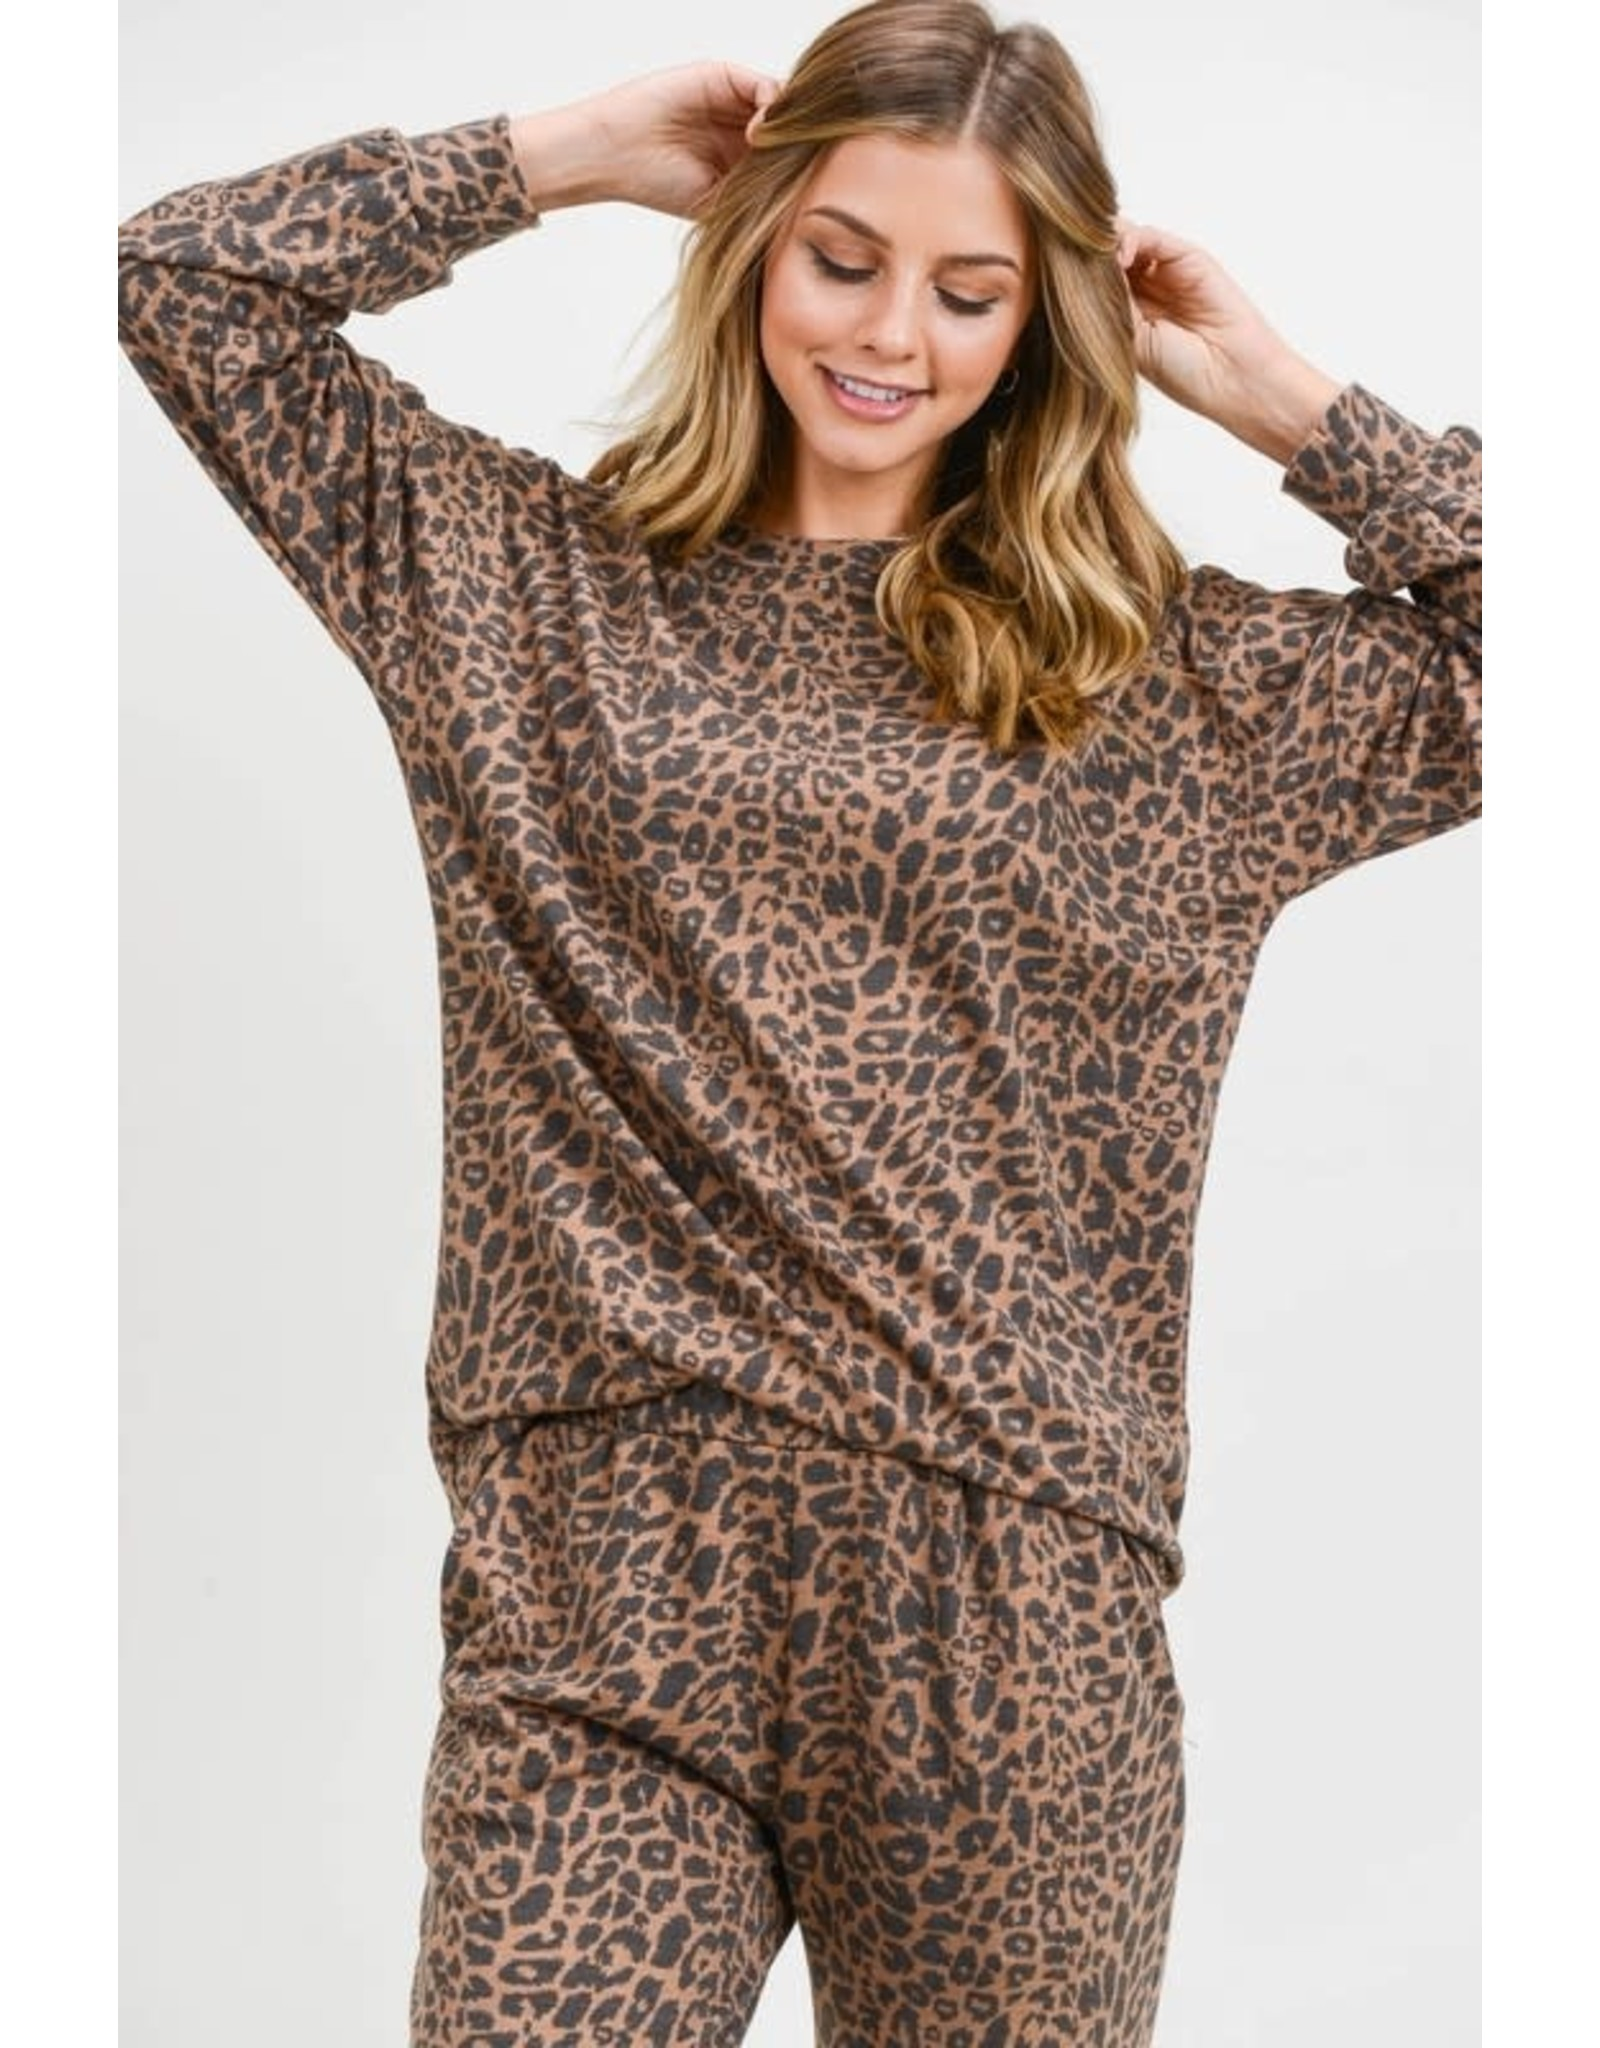 First Love Leopard Long Sleeve Top